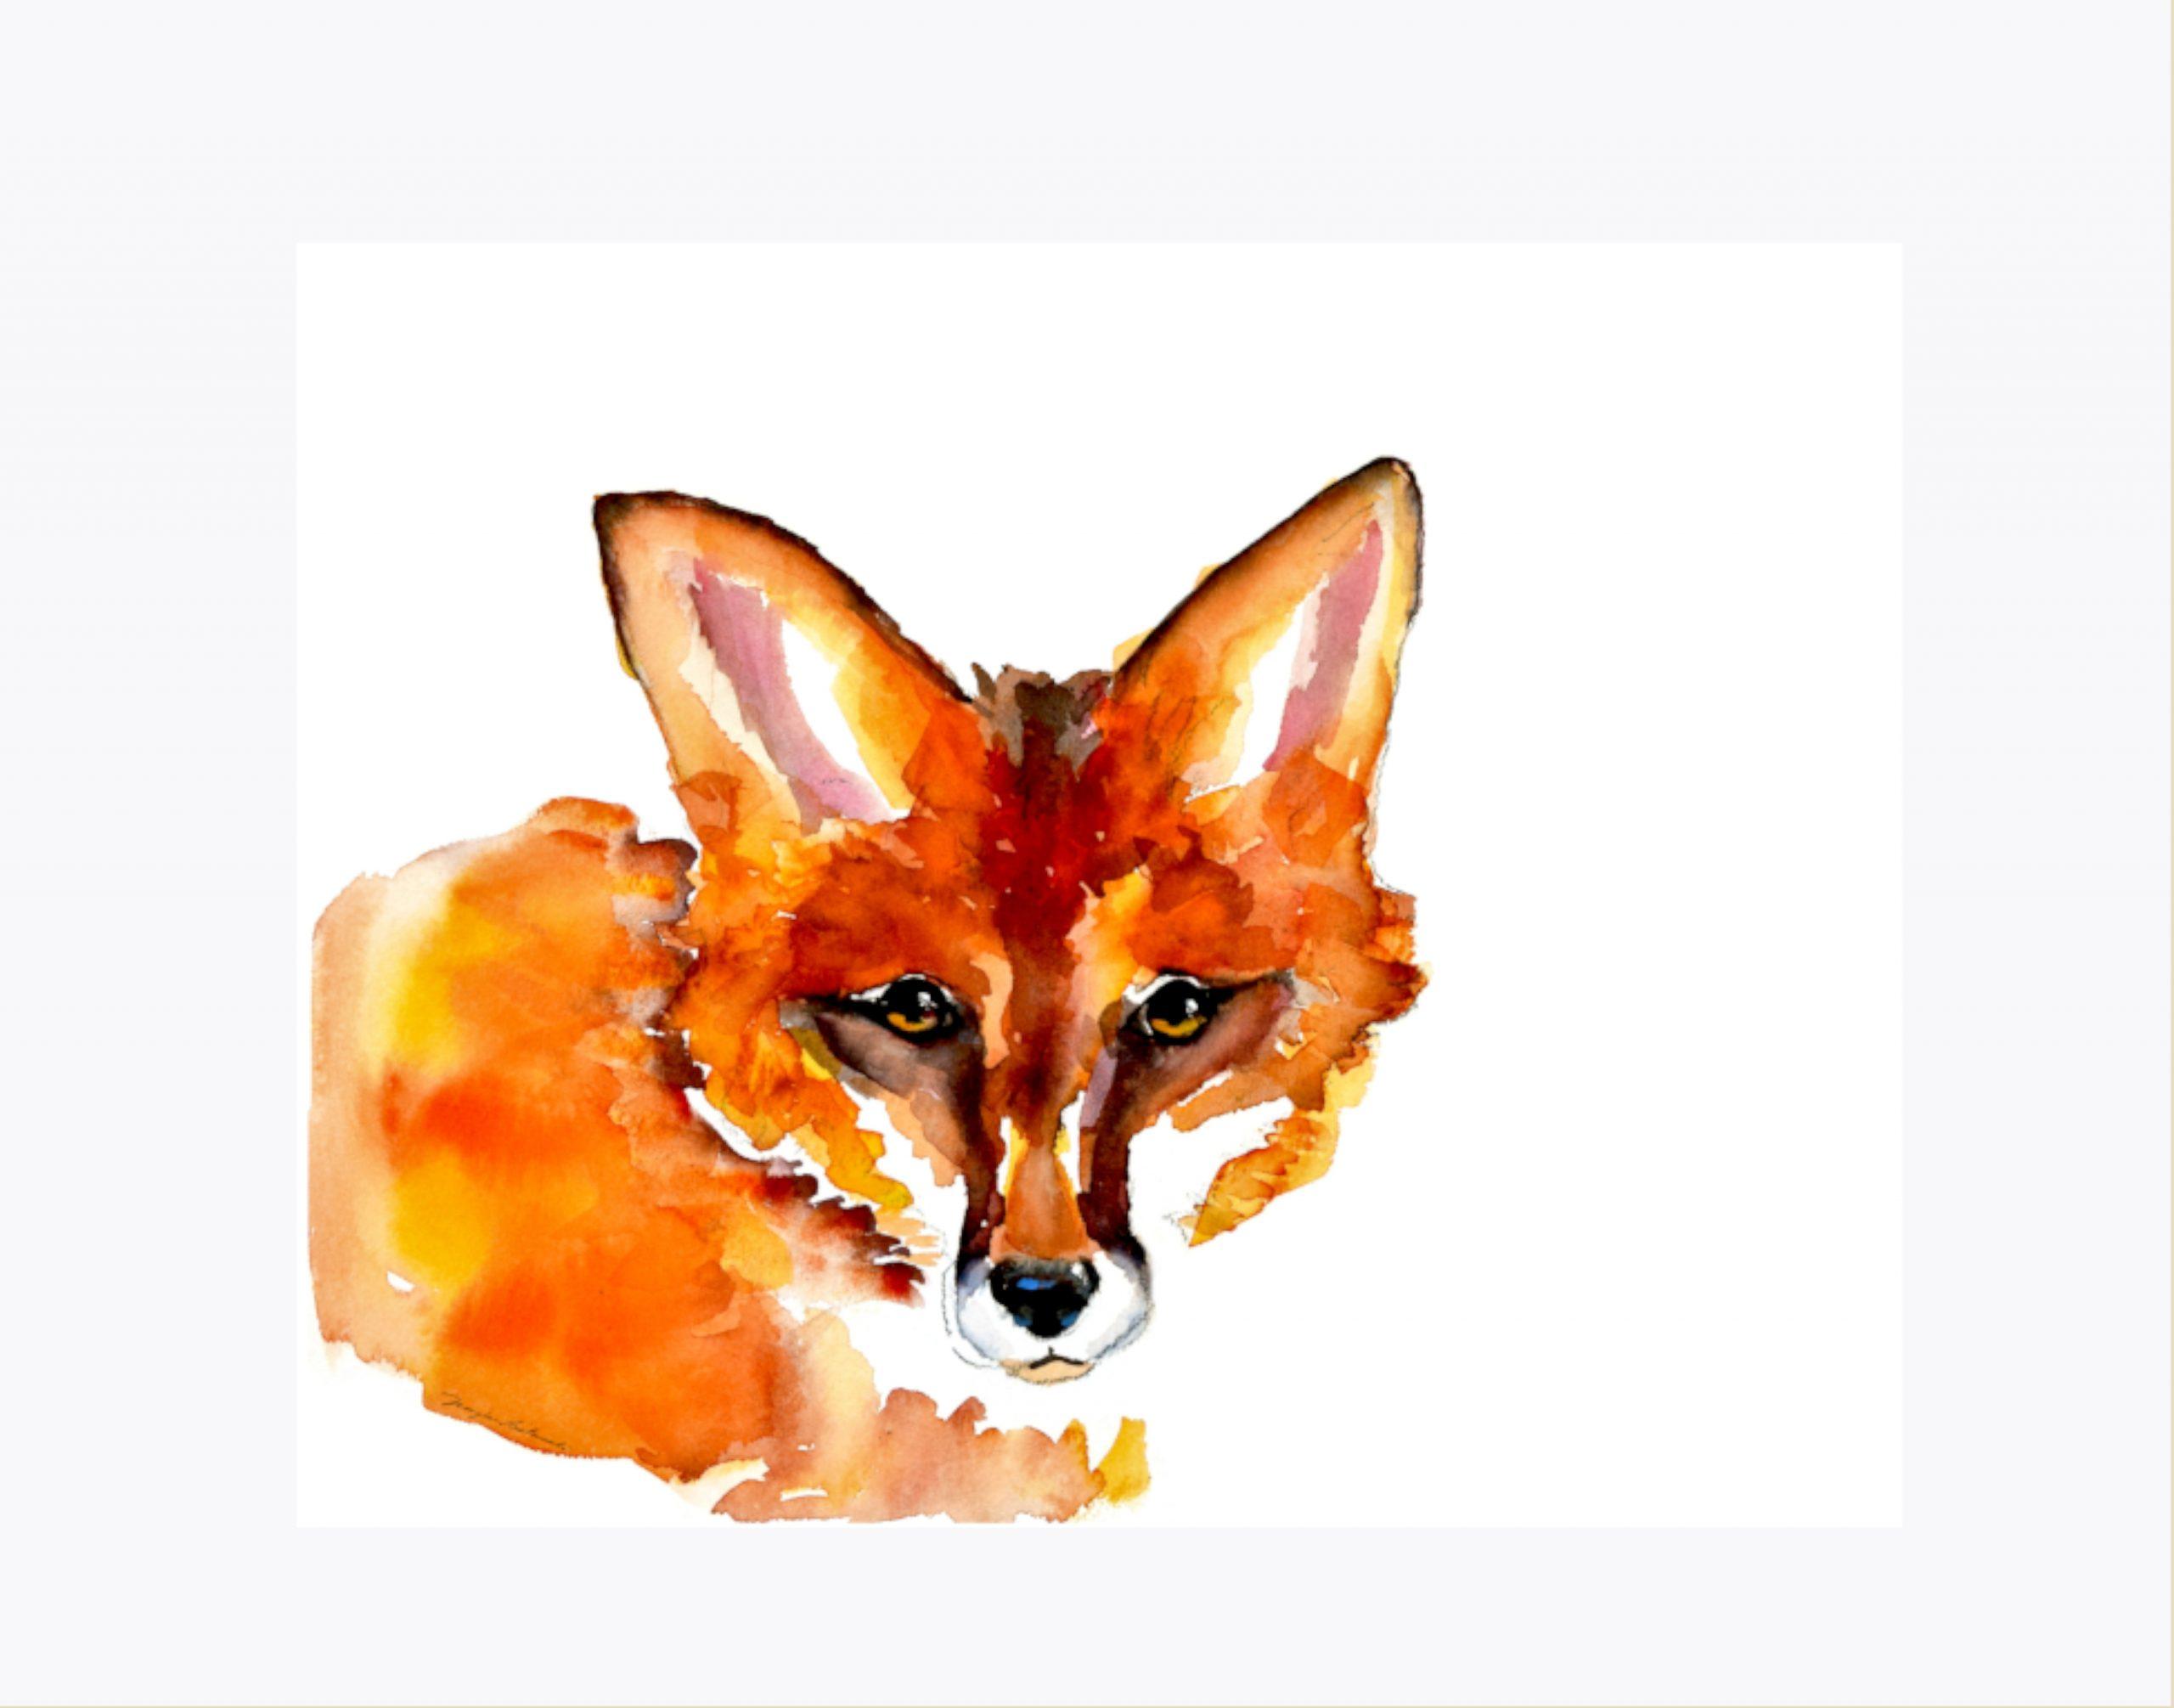 peeking red fox with mat 72 dpi